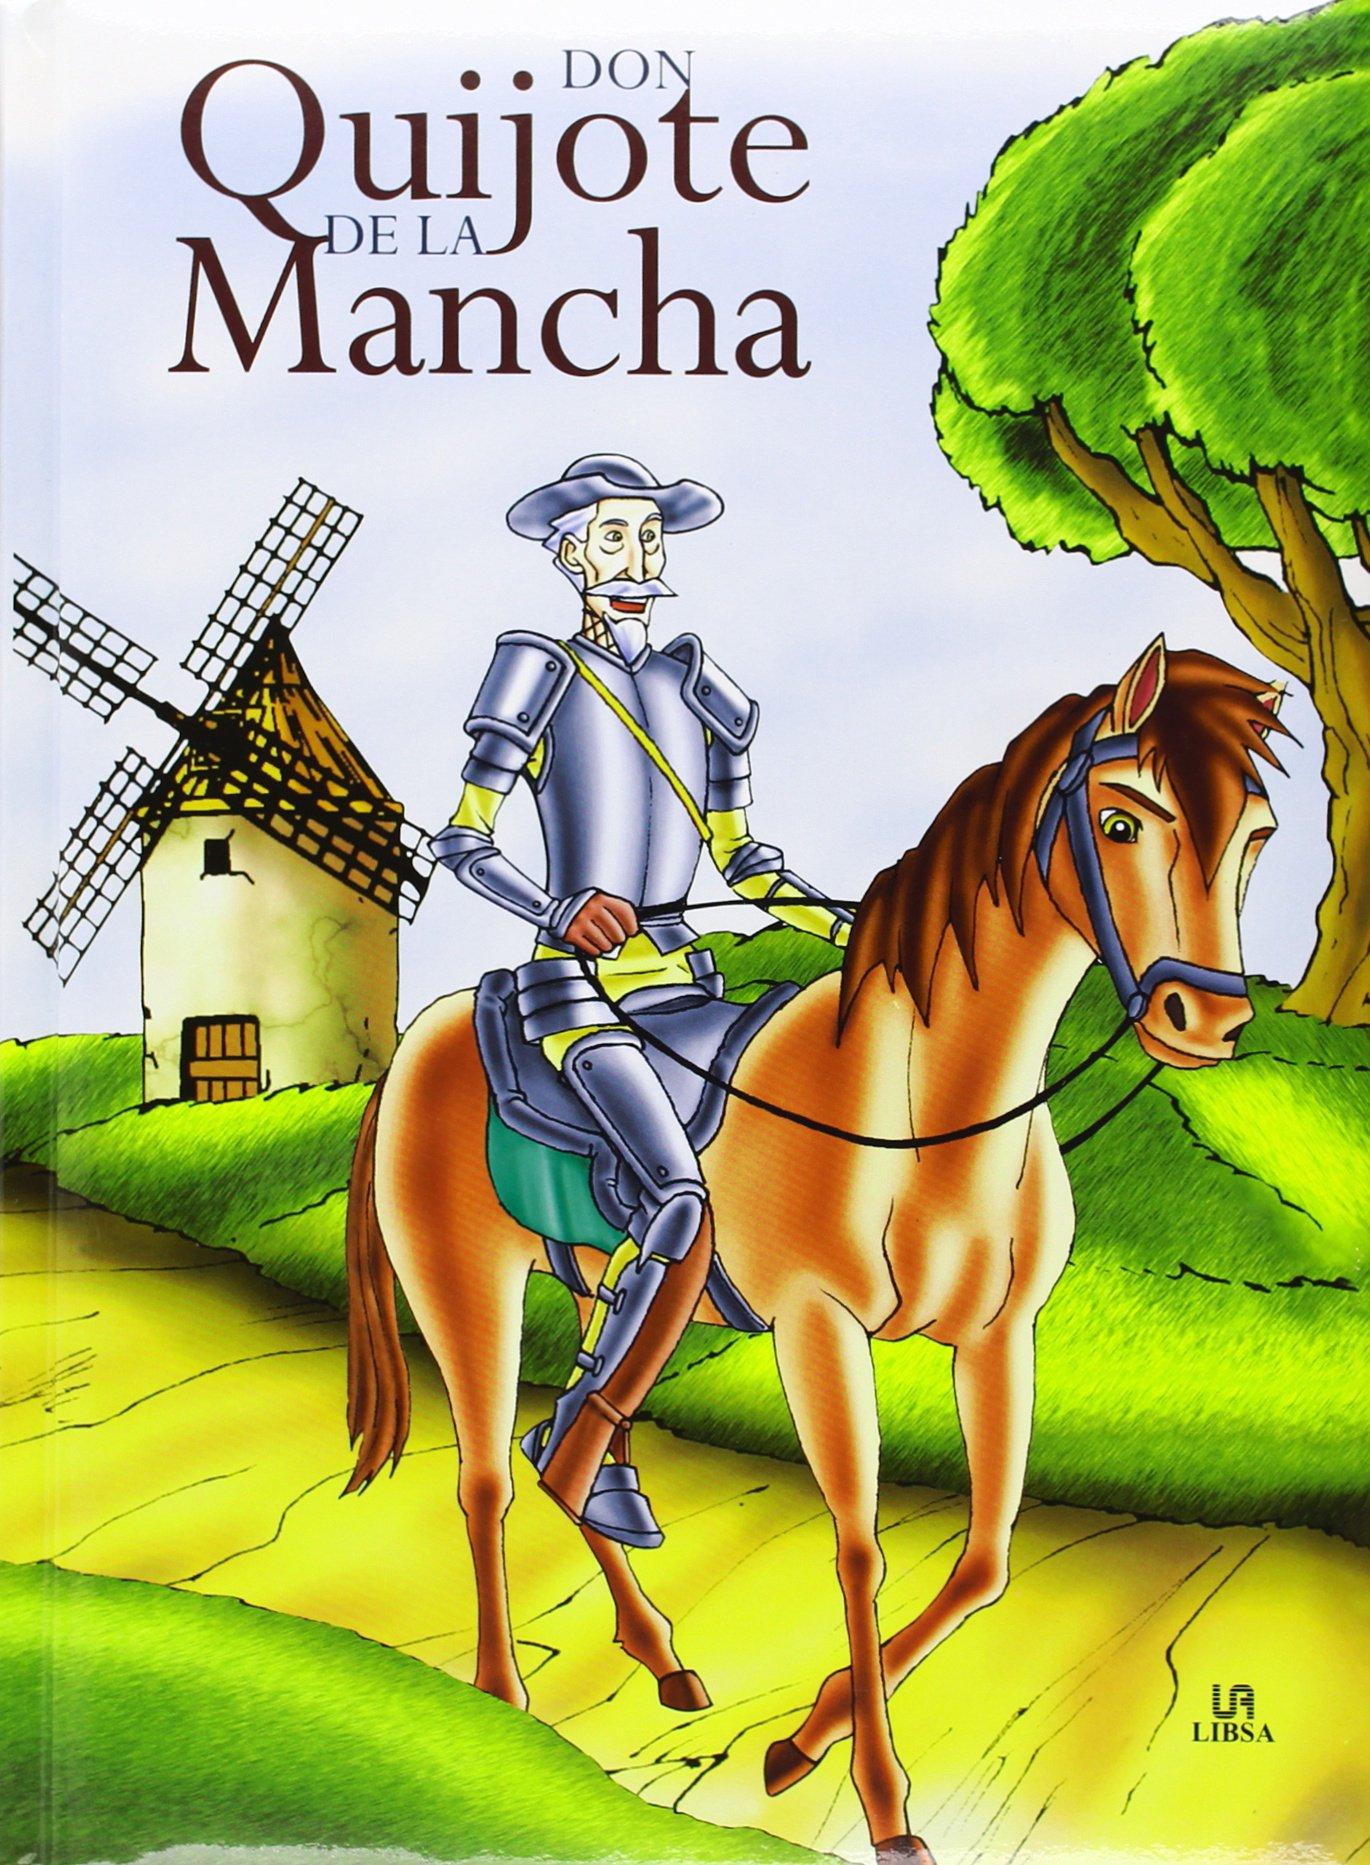 Don Quijote de la Mancha: Amazon.co.uk: Alejandra;Celis, Agustin ...